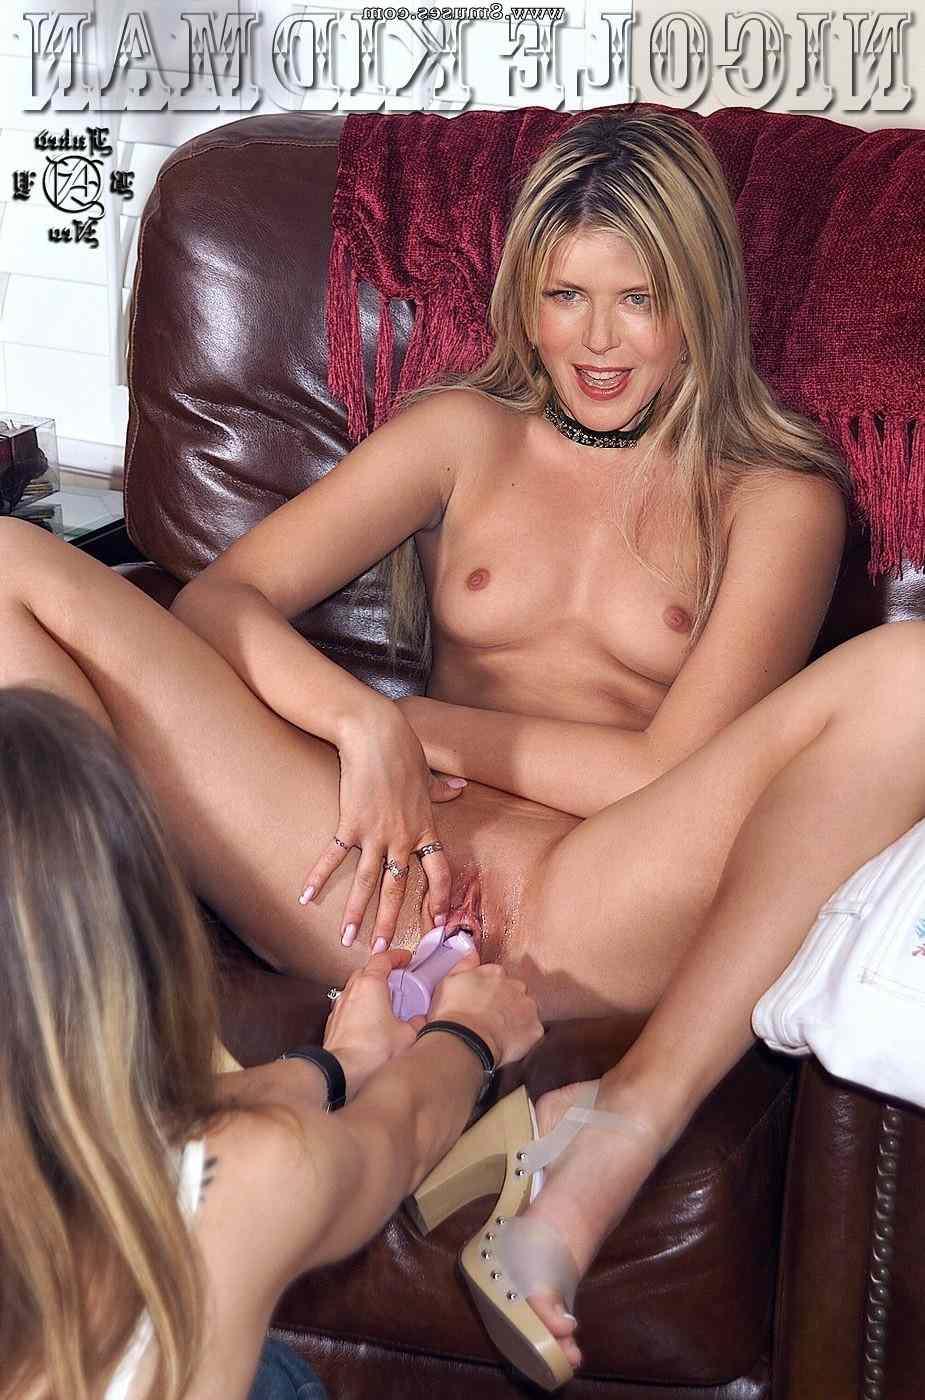 Fake-Celebrities-Sex-Pictures/Nicole-Kidman Nicole_Kidman__8muses_-_Sex_and_Porn_Comics_657.jpg